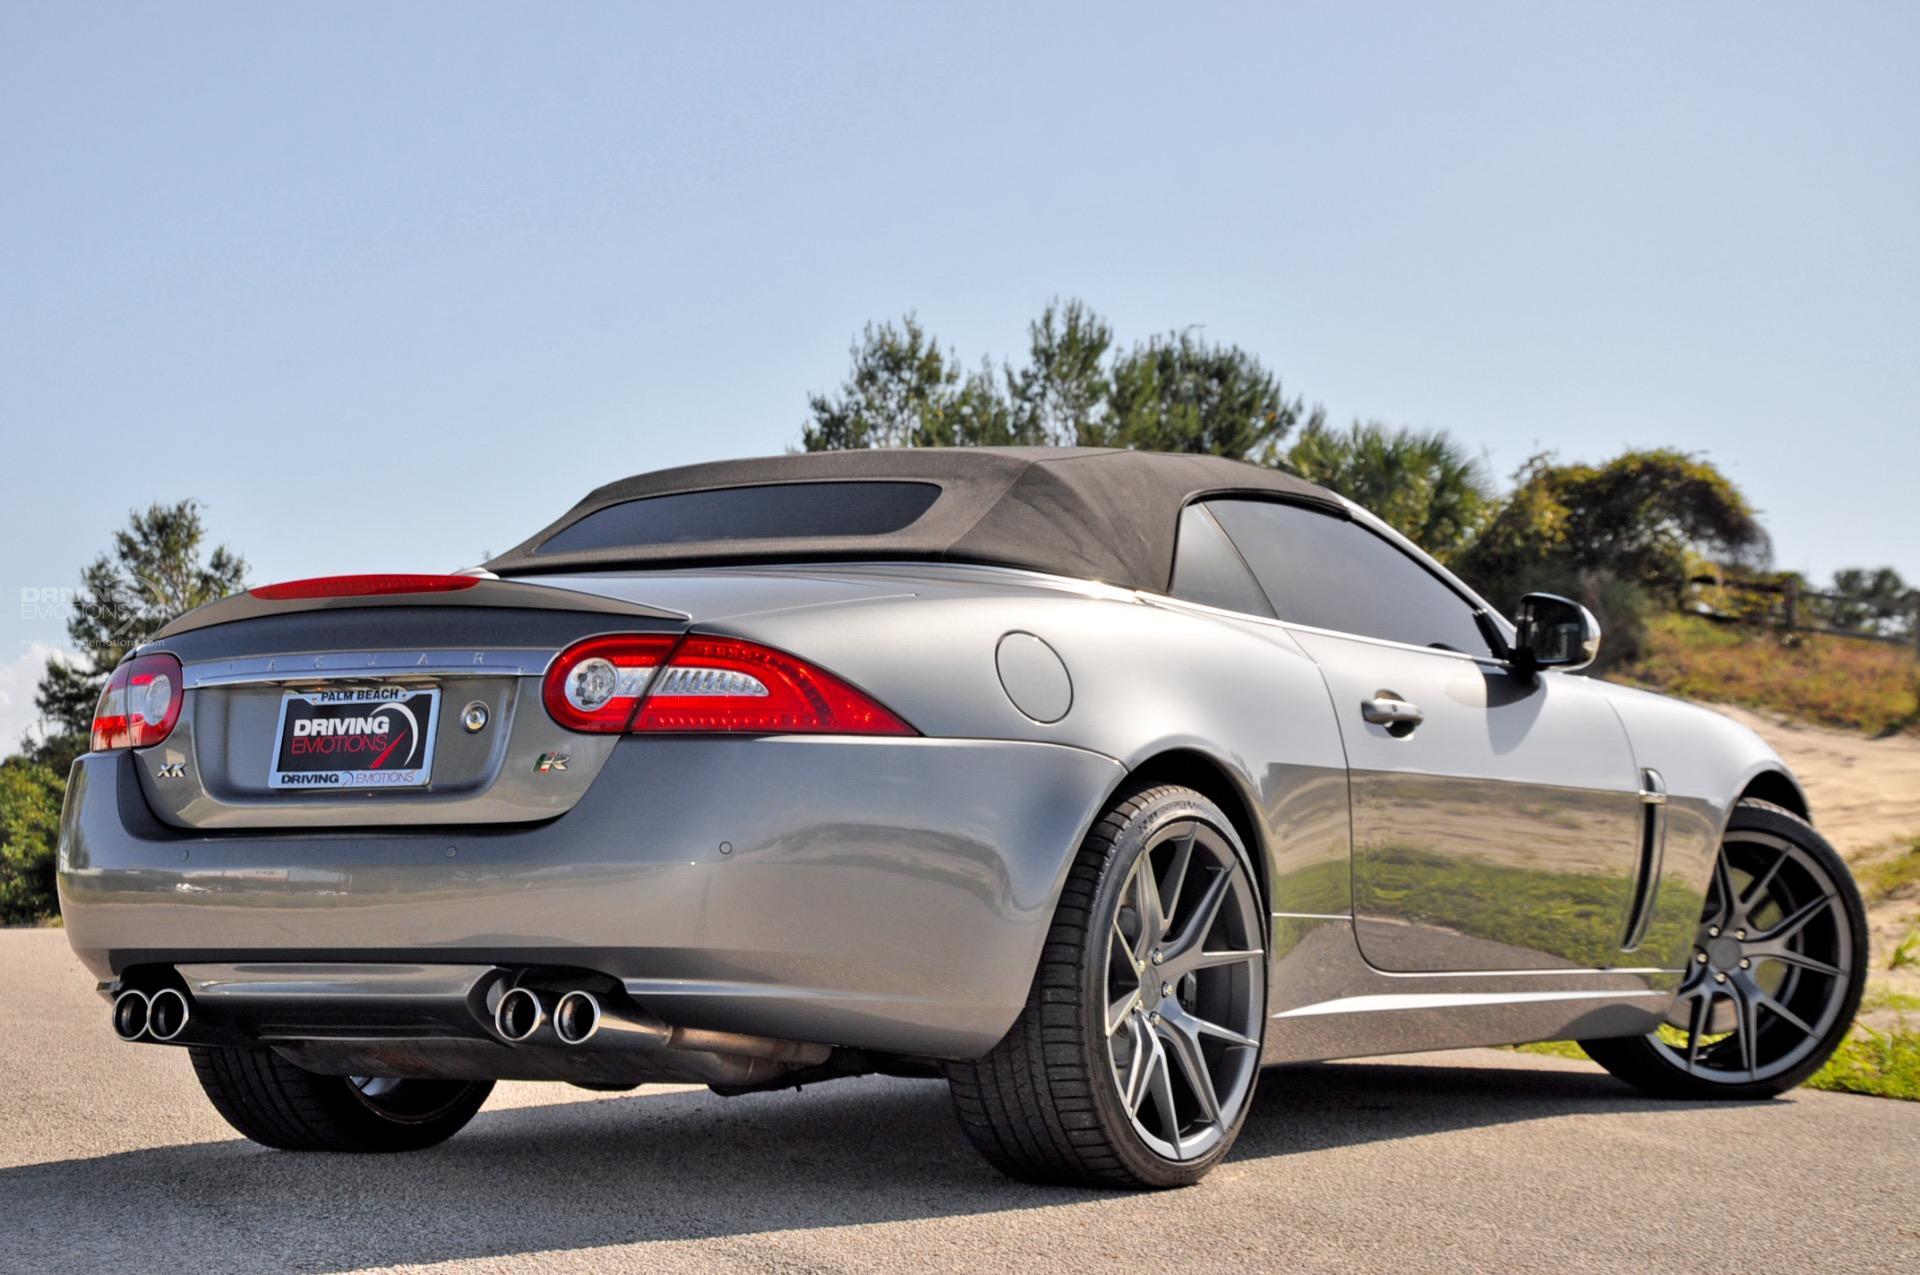 convertible facelift generation xkr db jaguar f